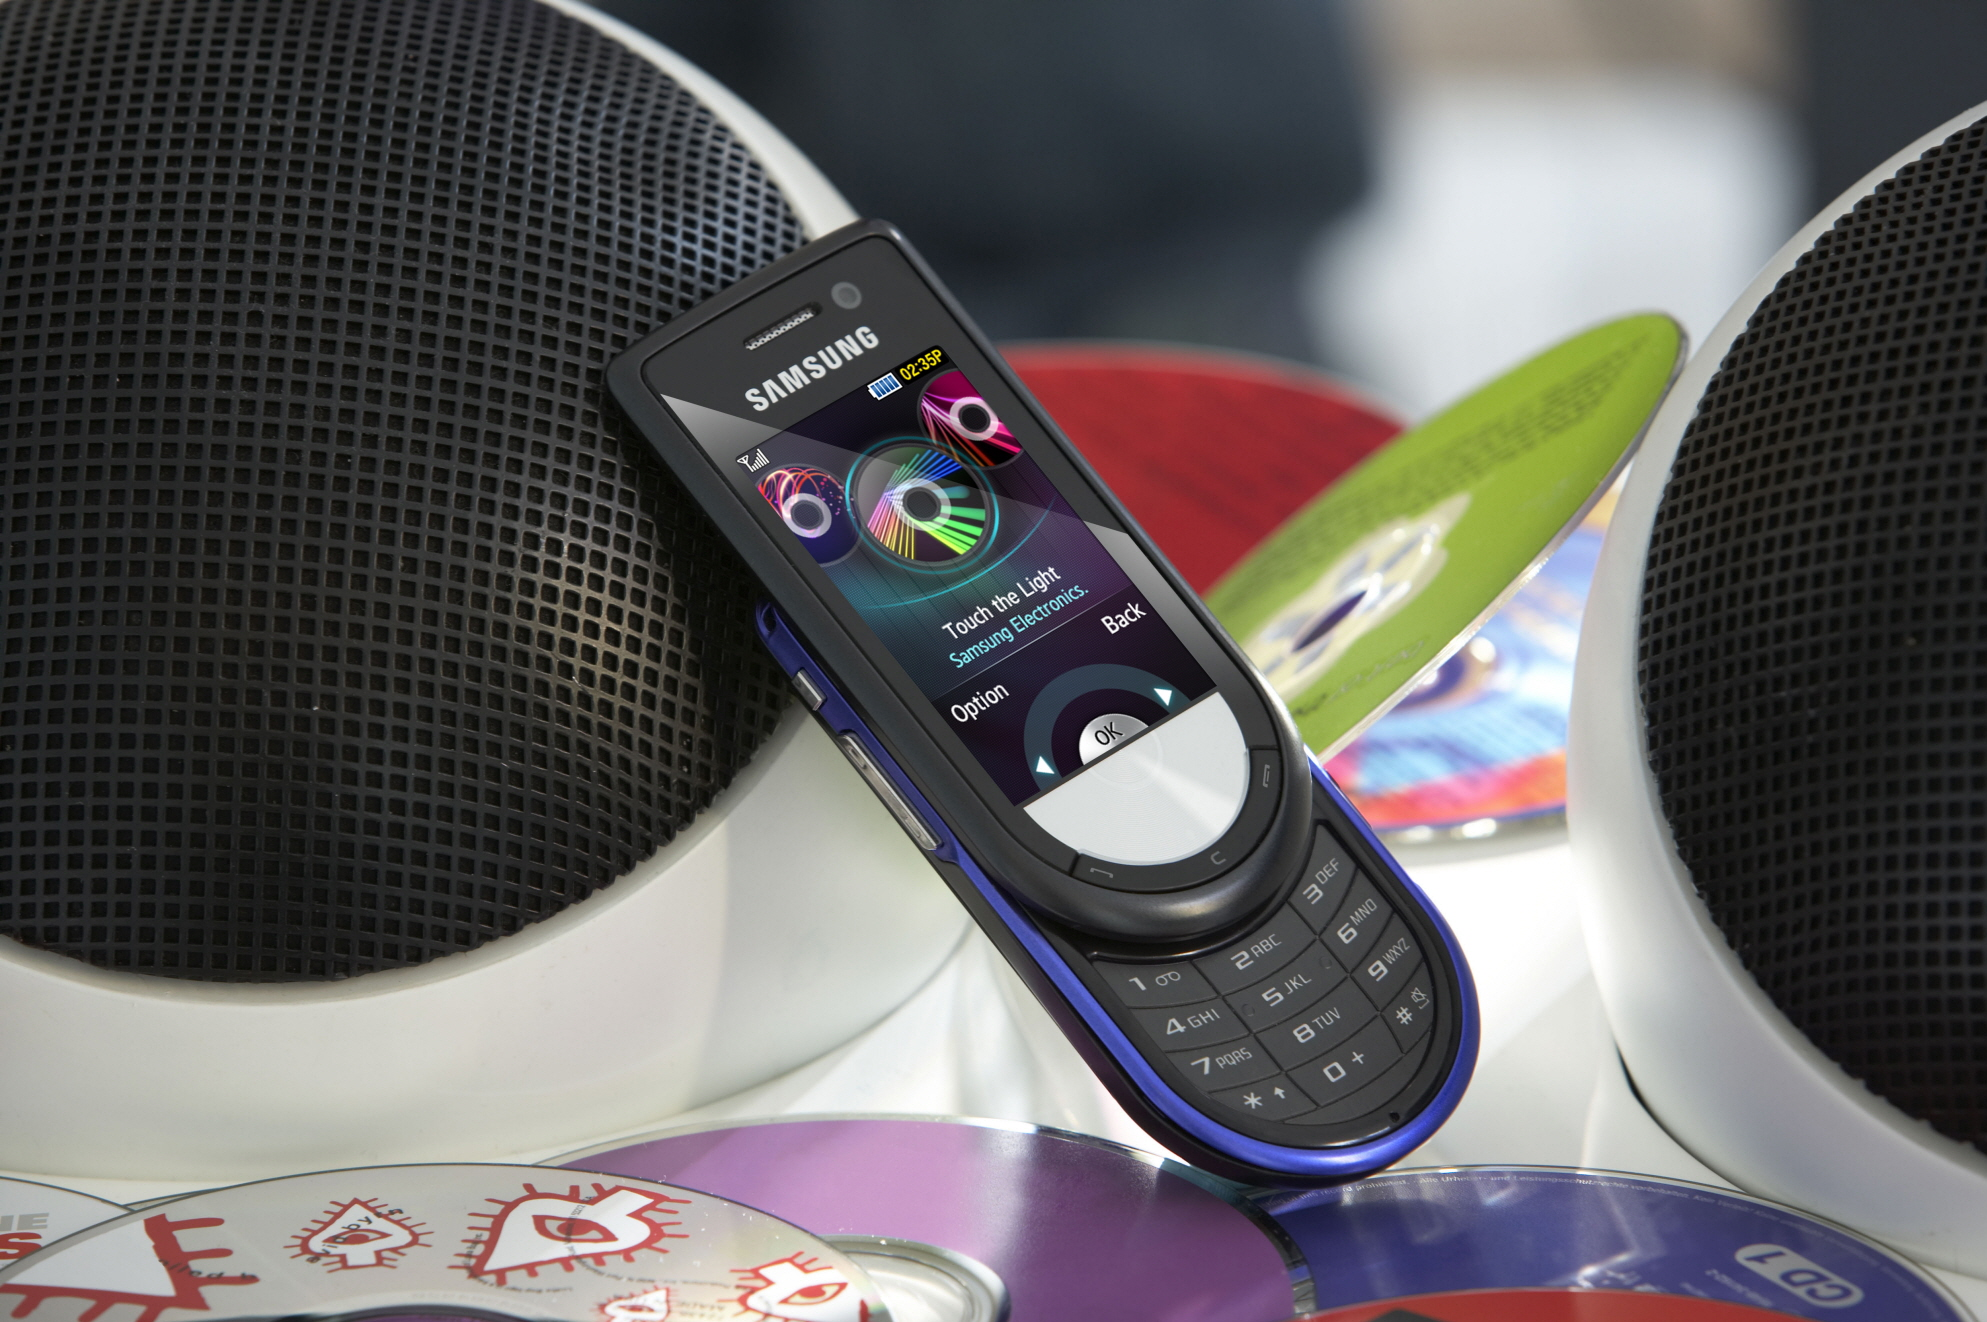 Samsung beat edition phones